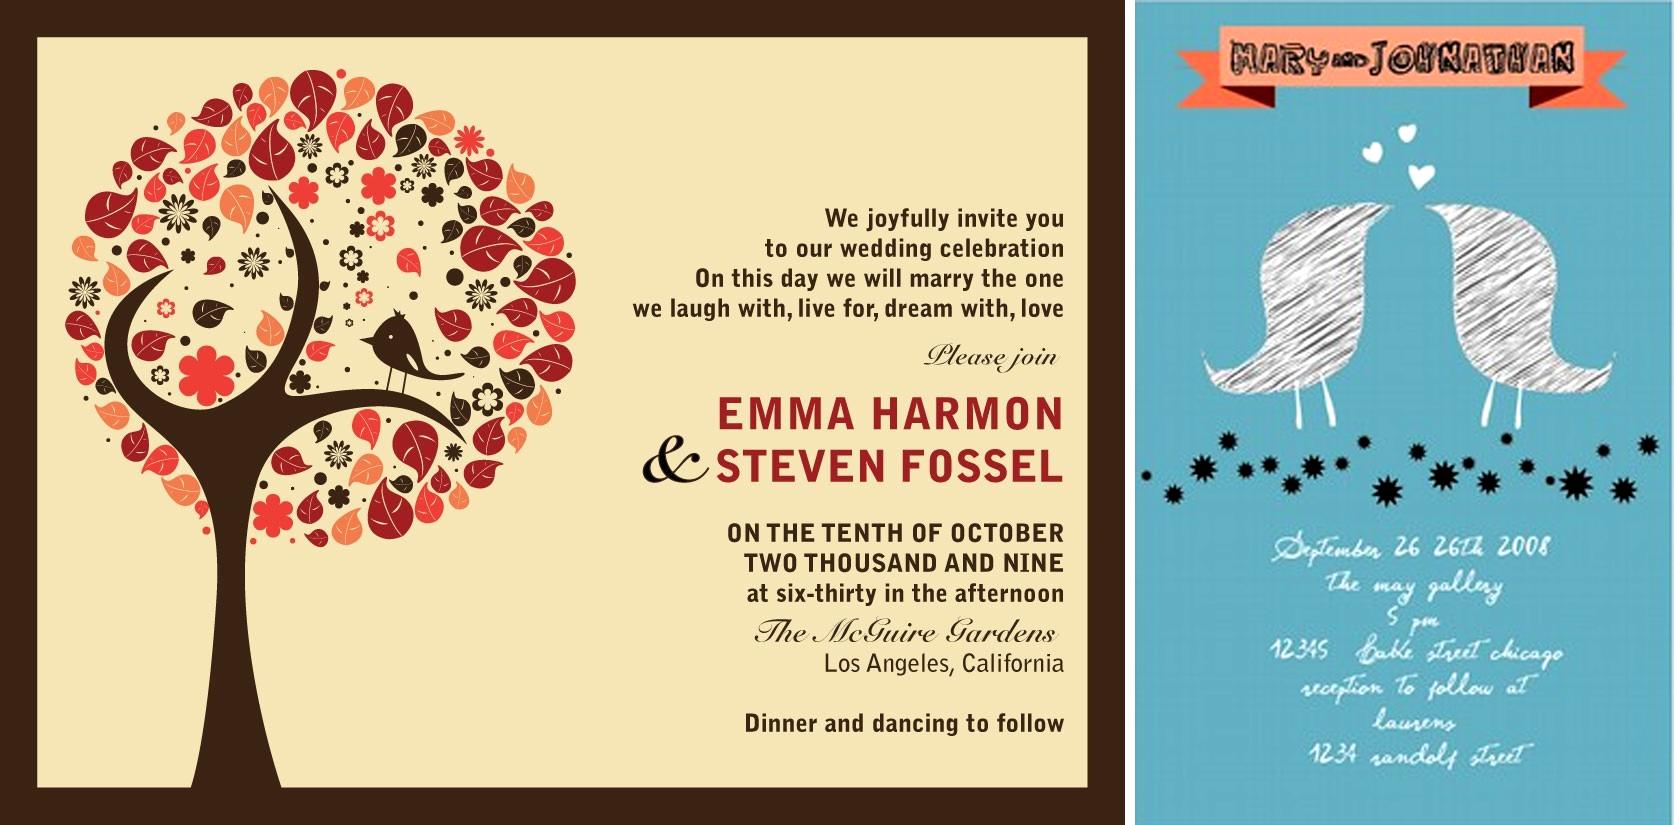 wedding invitation | The Best Wedding Blog Ever by Marilyn\'s Keepsakes